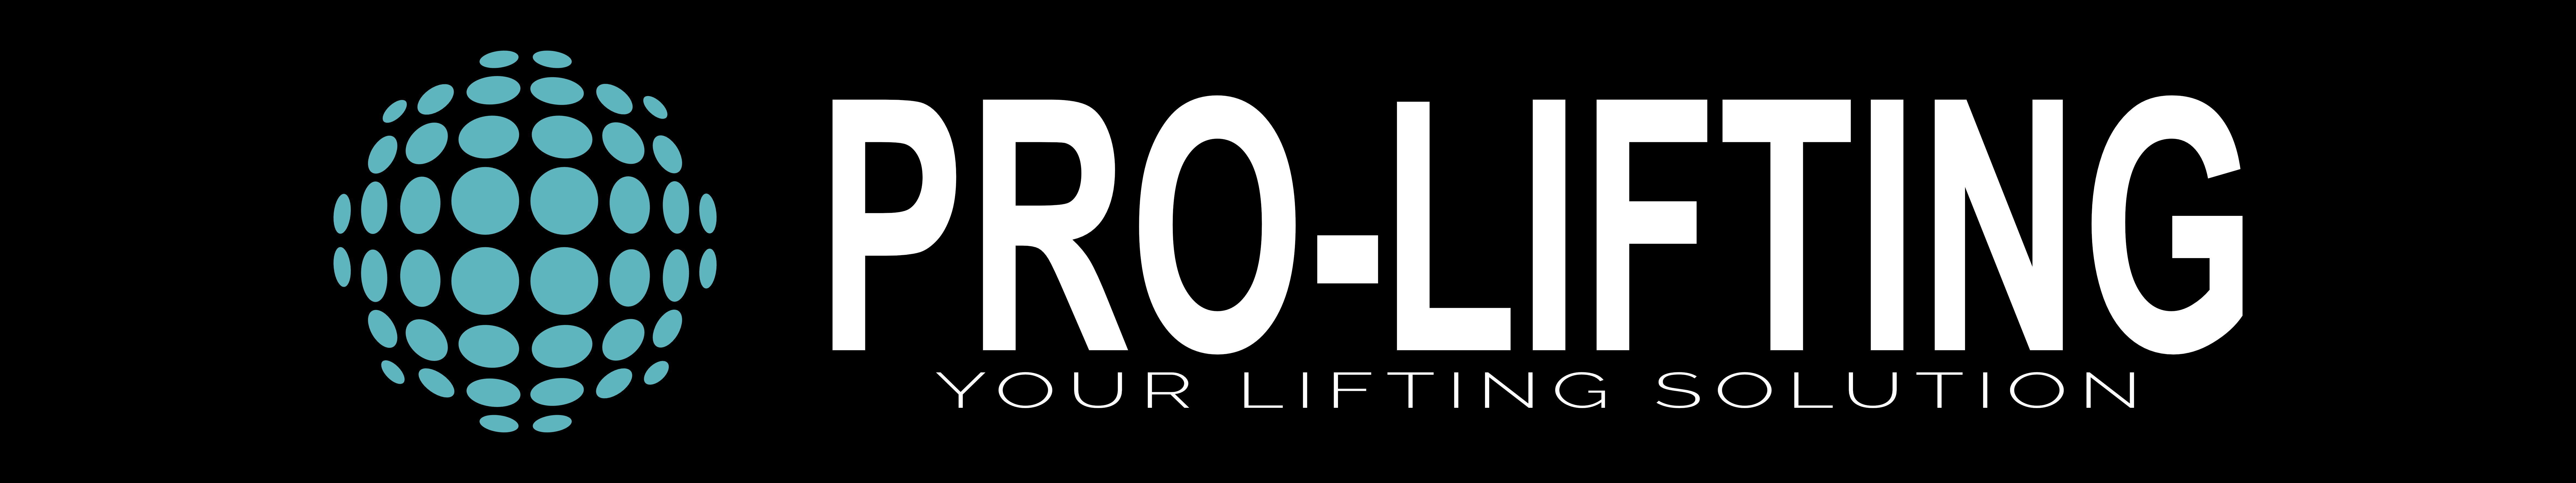 Pro-lifting